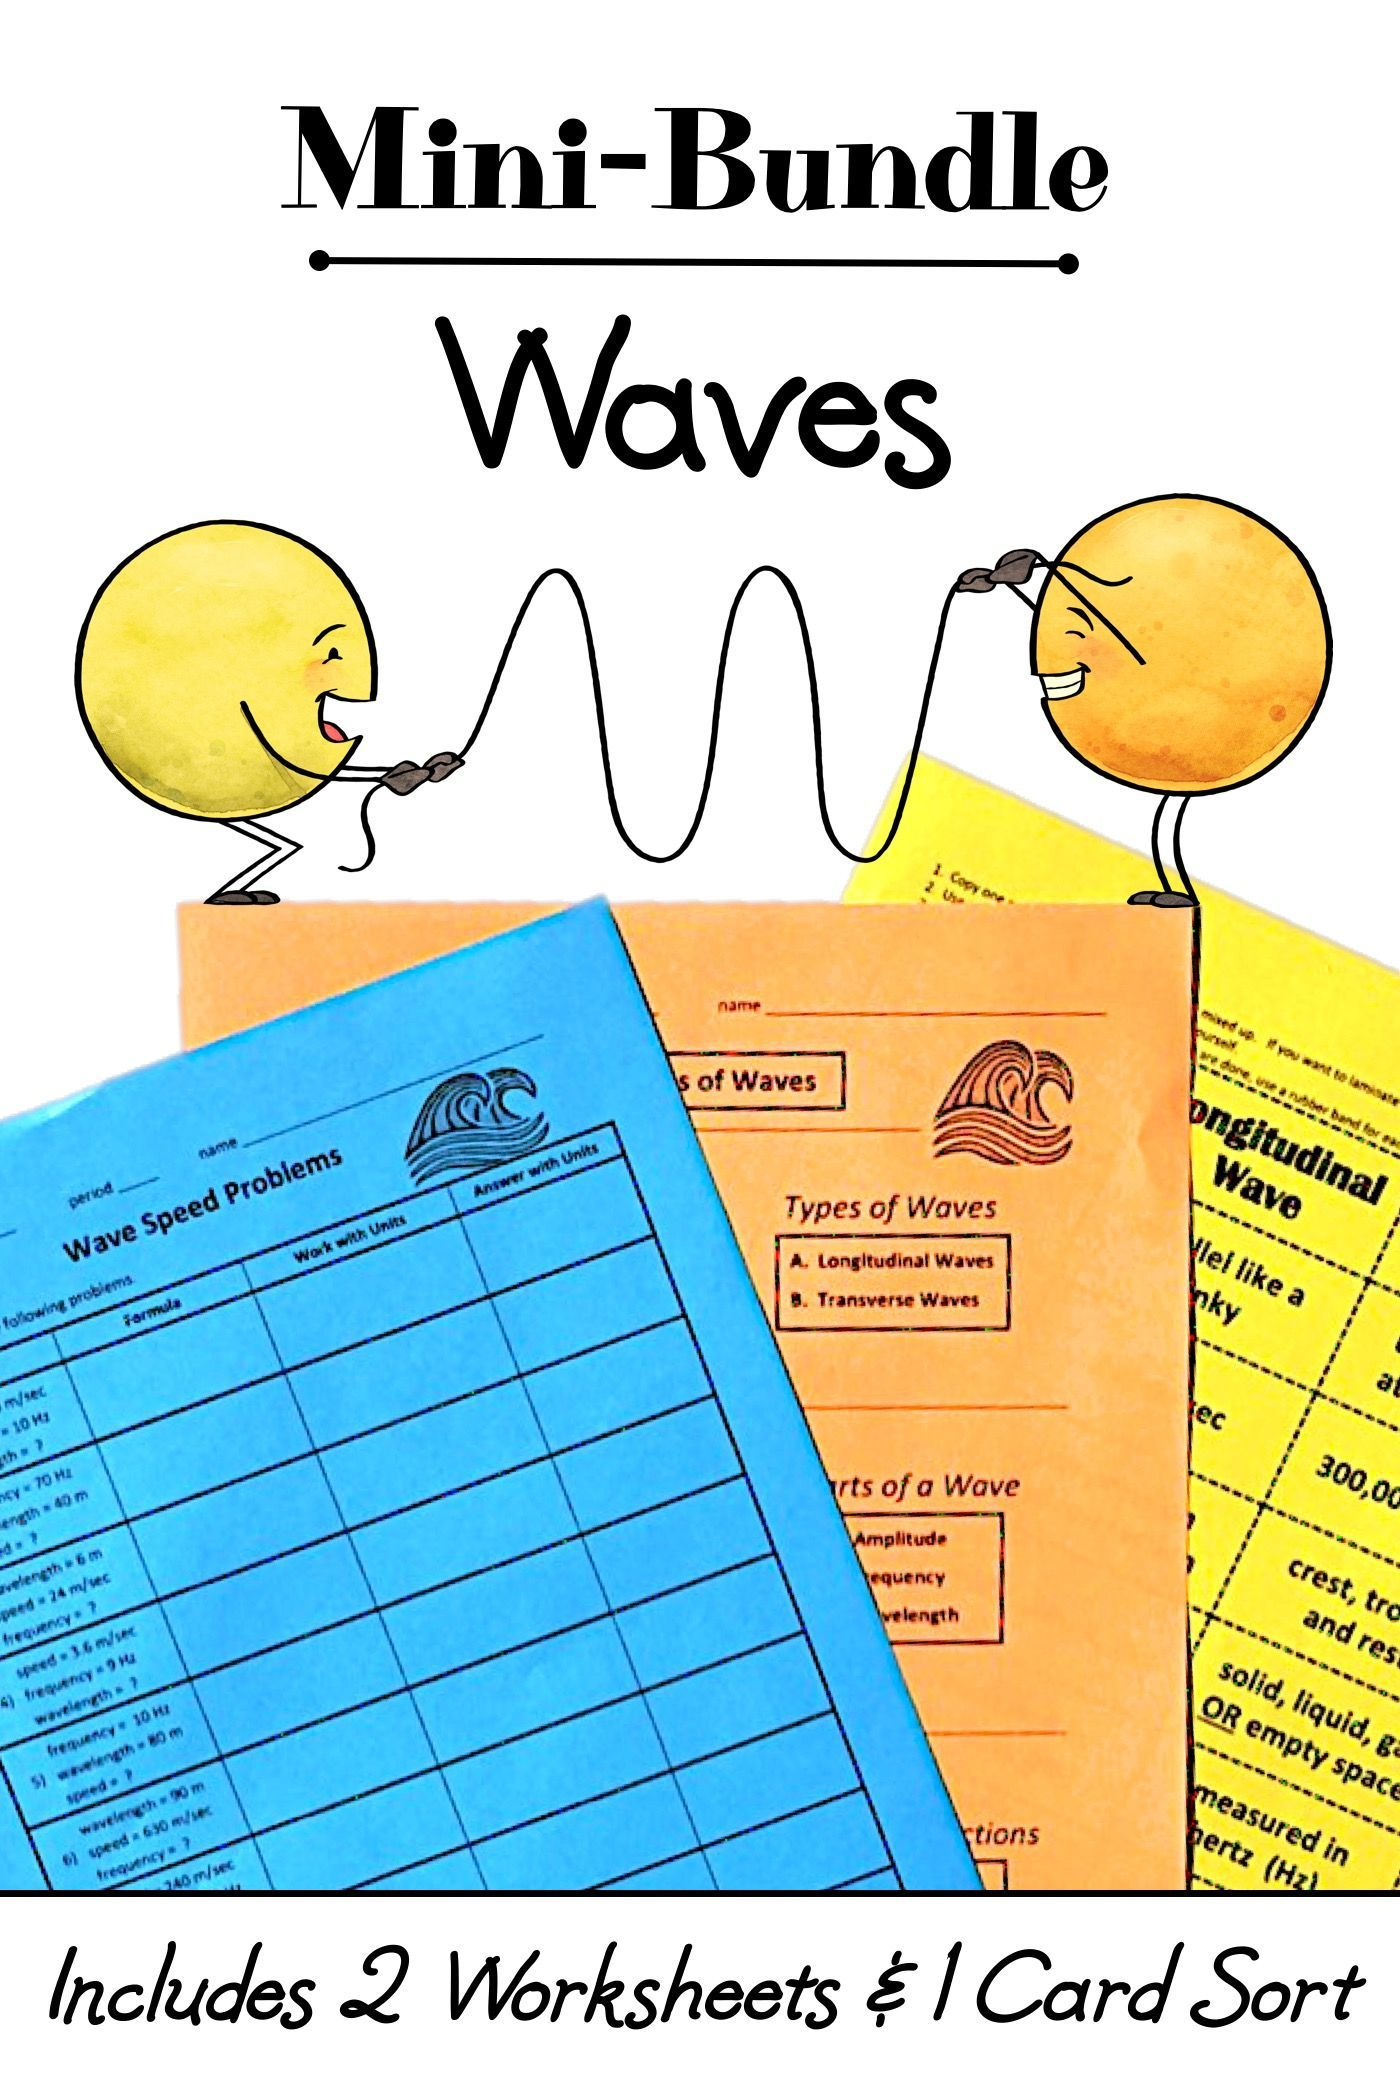 hight resolution of Waves Mini-Bundle - Card Sort + 2 Worksheet Activities   Free science  worksheets